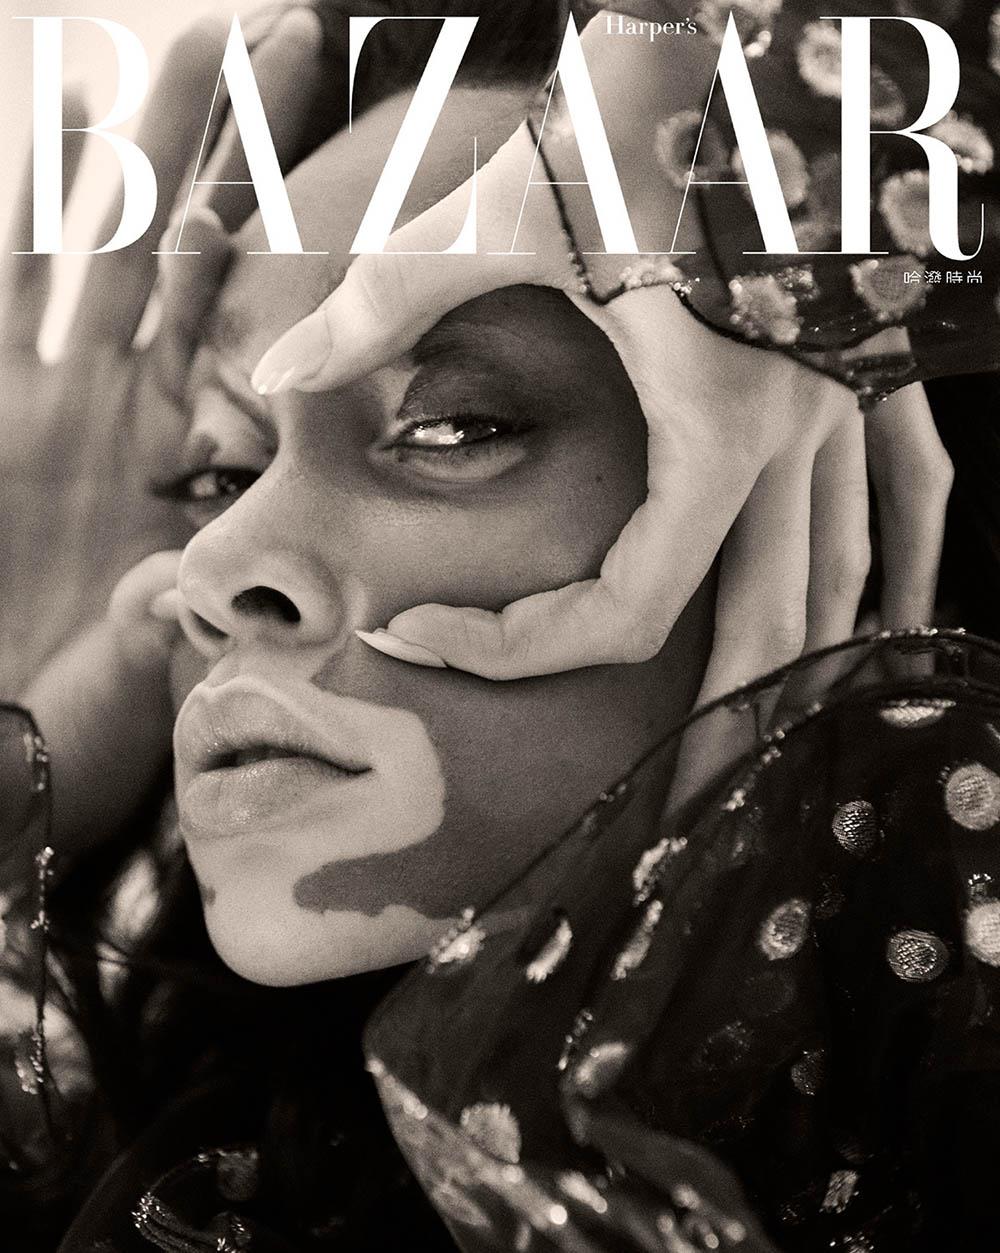 Winnie Harlow covers Harper's Bazaar Taiwan March 2019 by Harper Smith